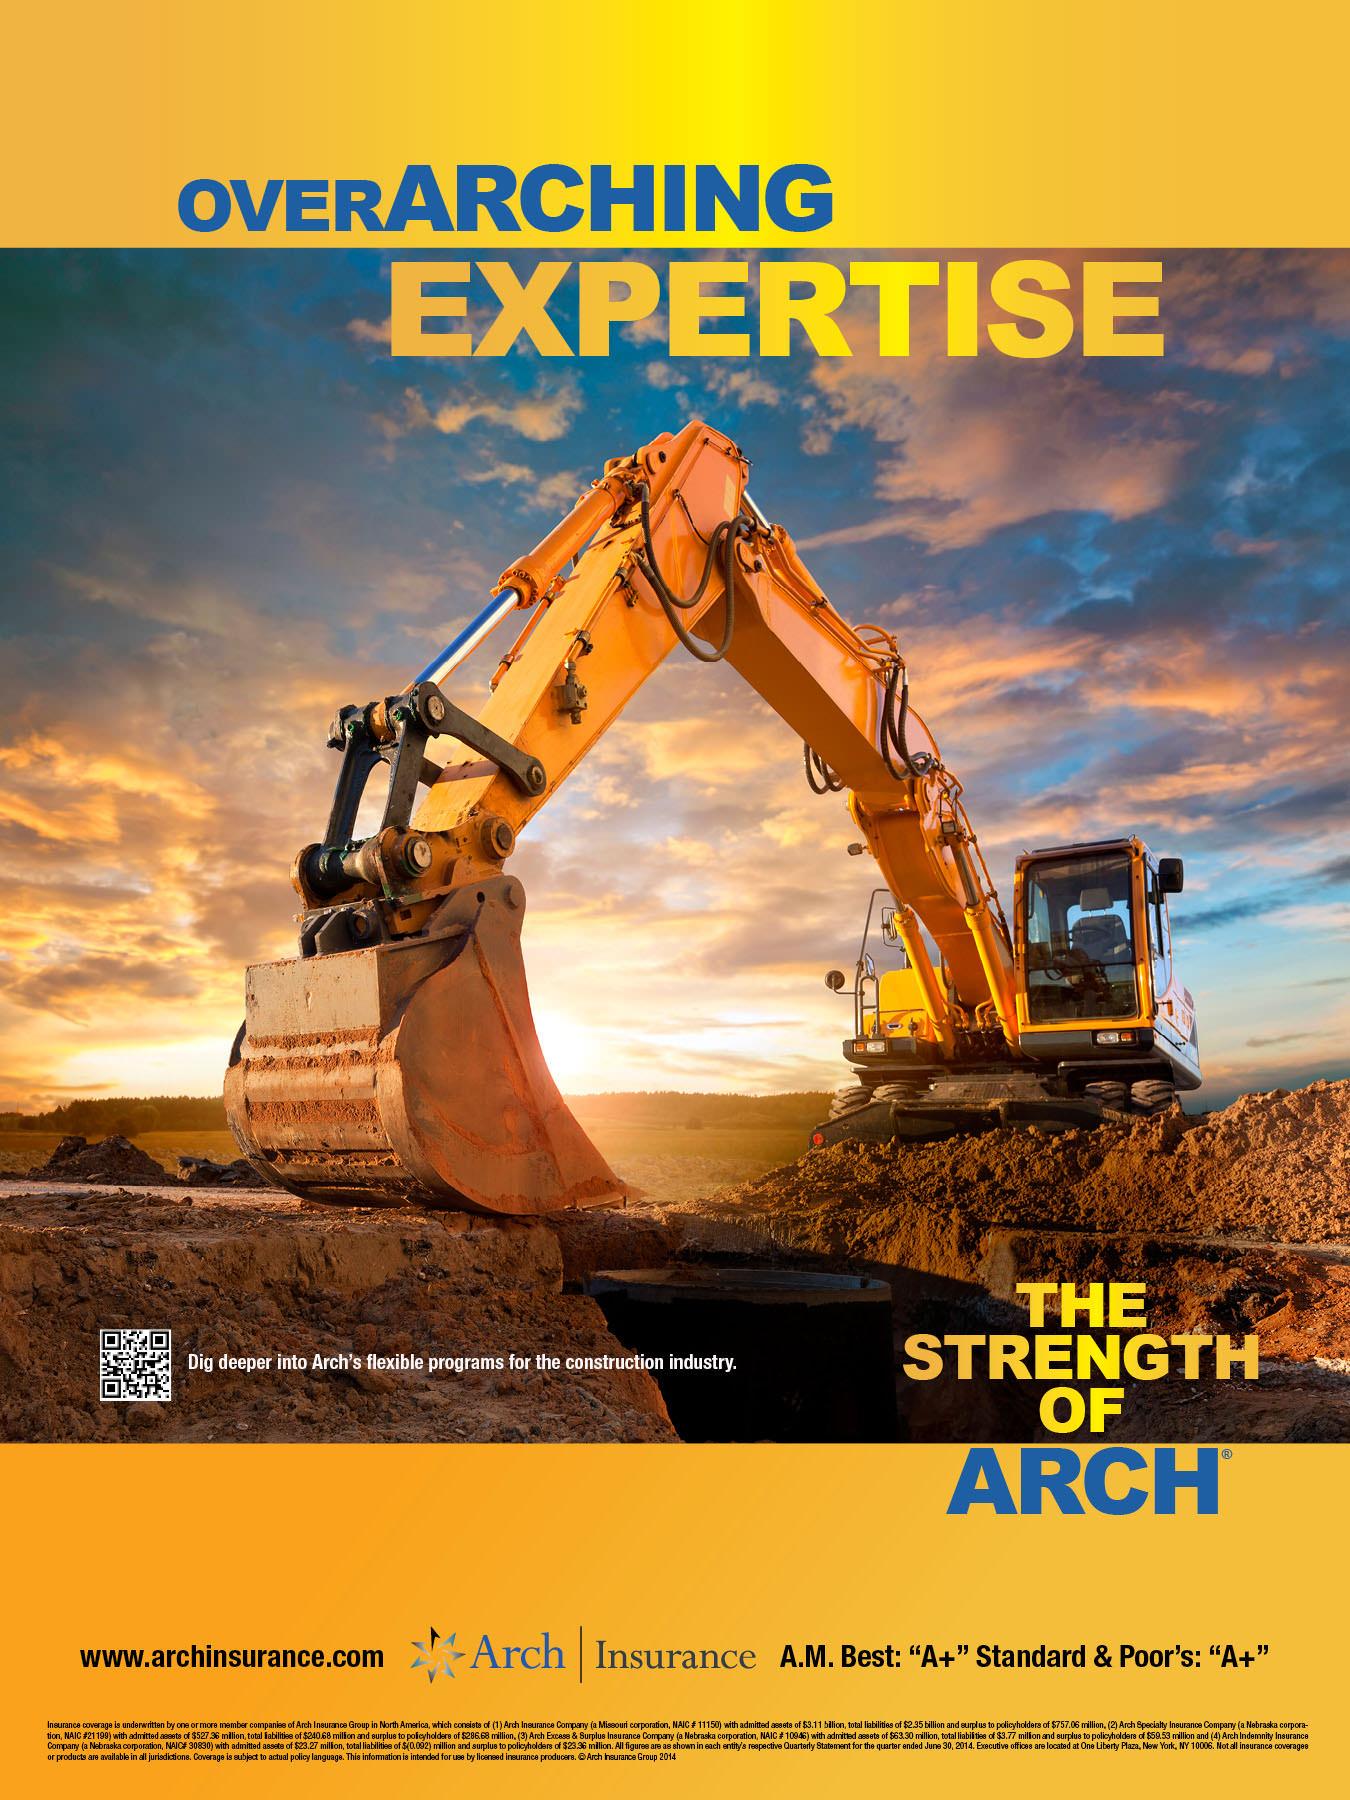 Arch Insurance PRINT-2-Construction 18x24Poster copy